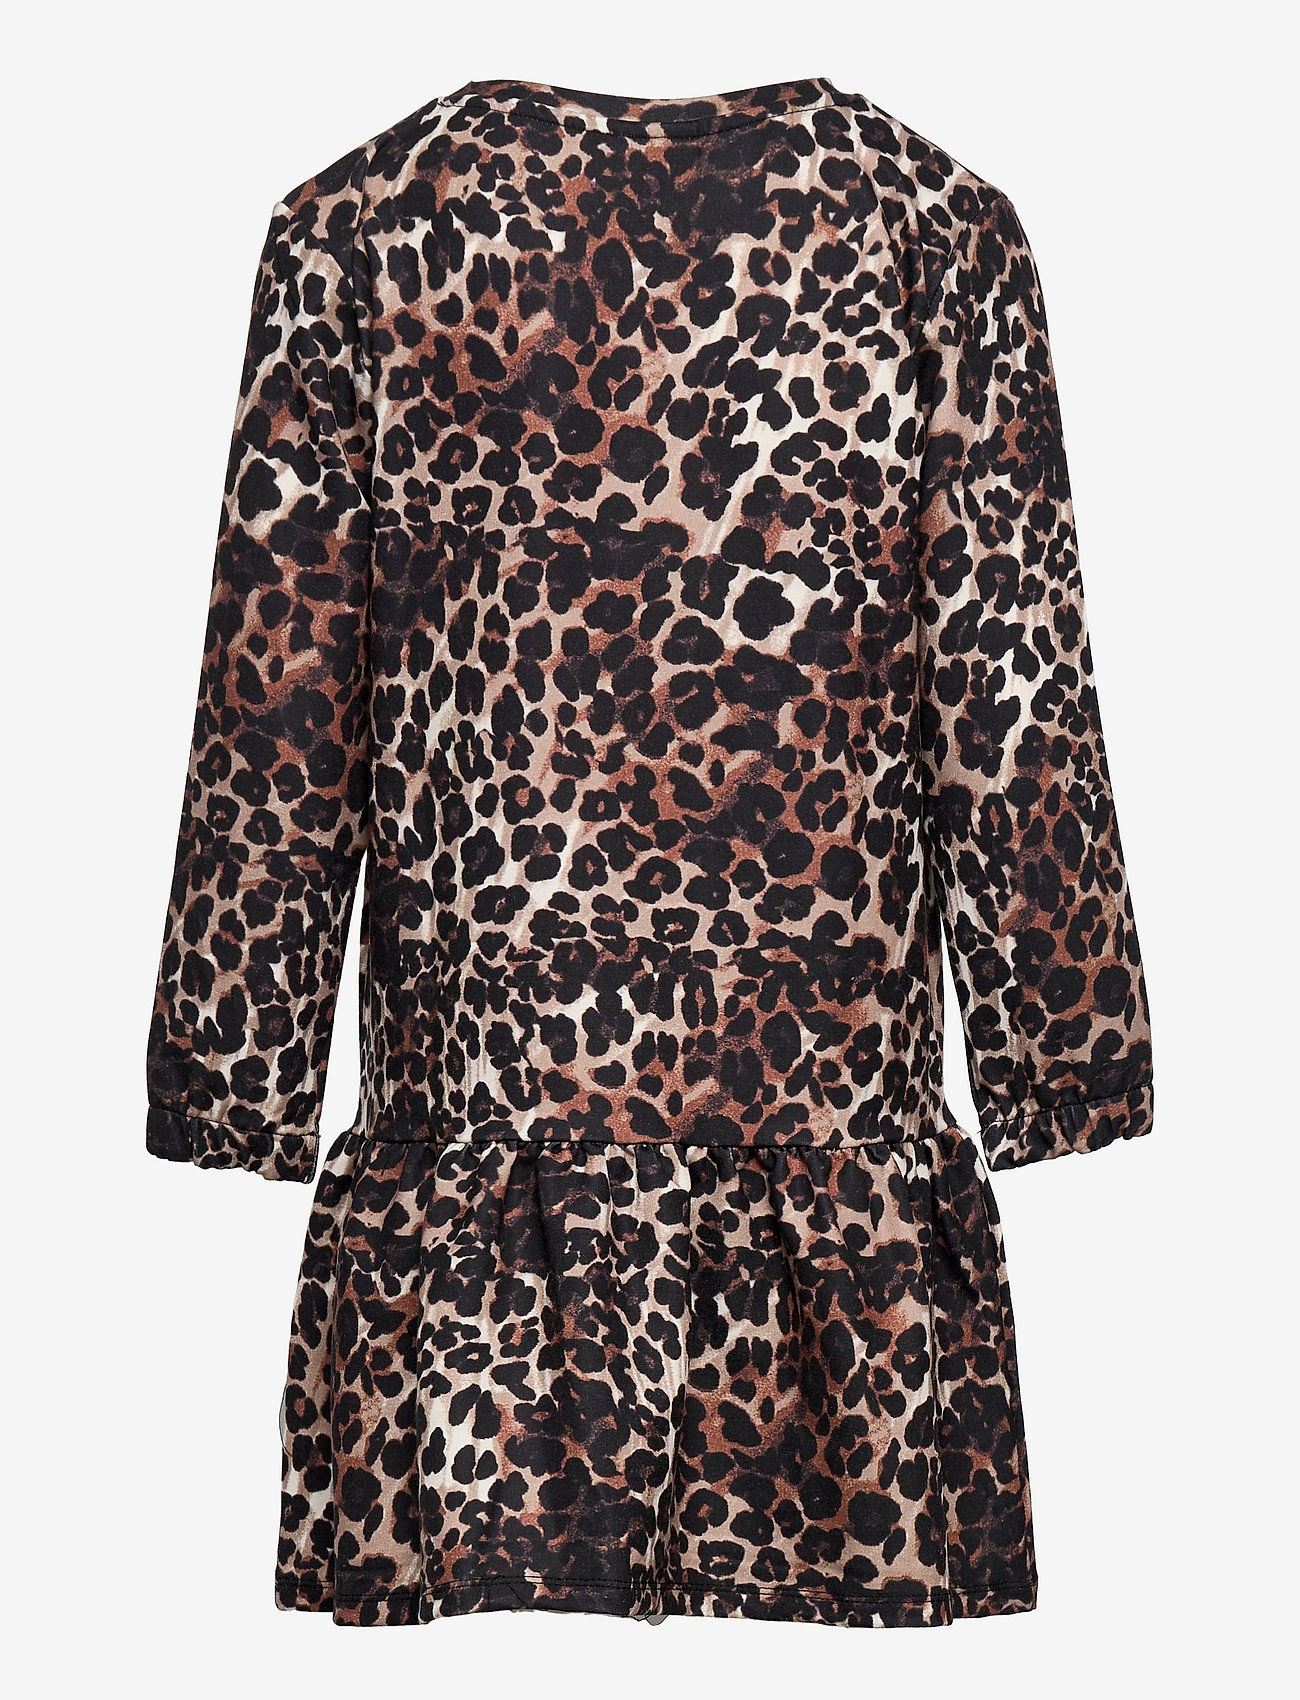 The New - PALEO SWEAT DRESS - kleider - brown leo - 1